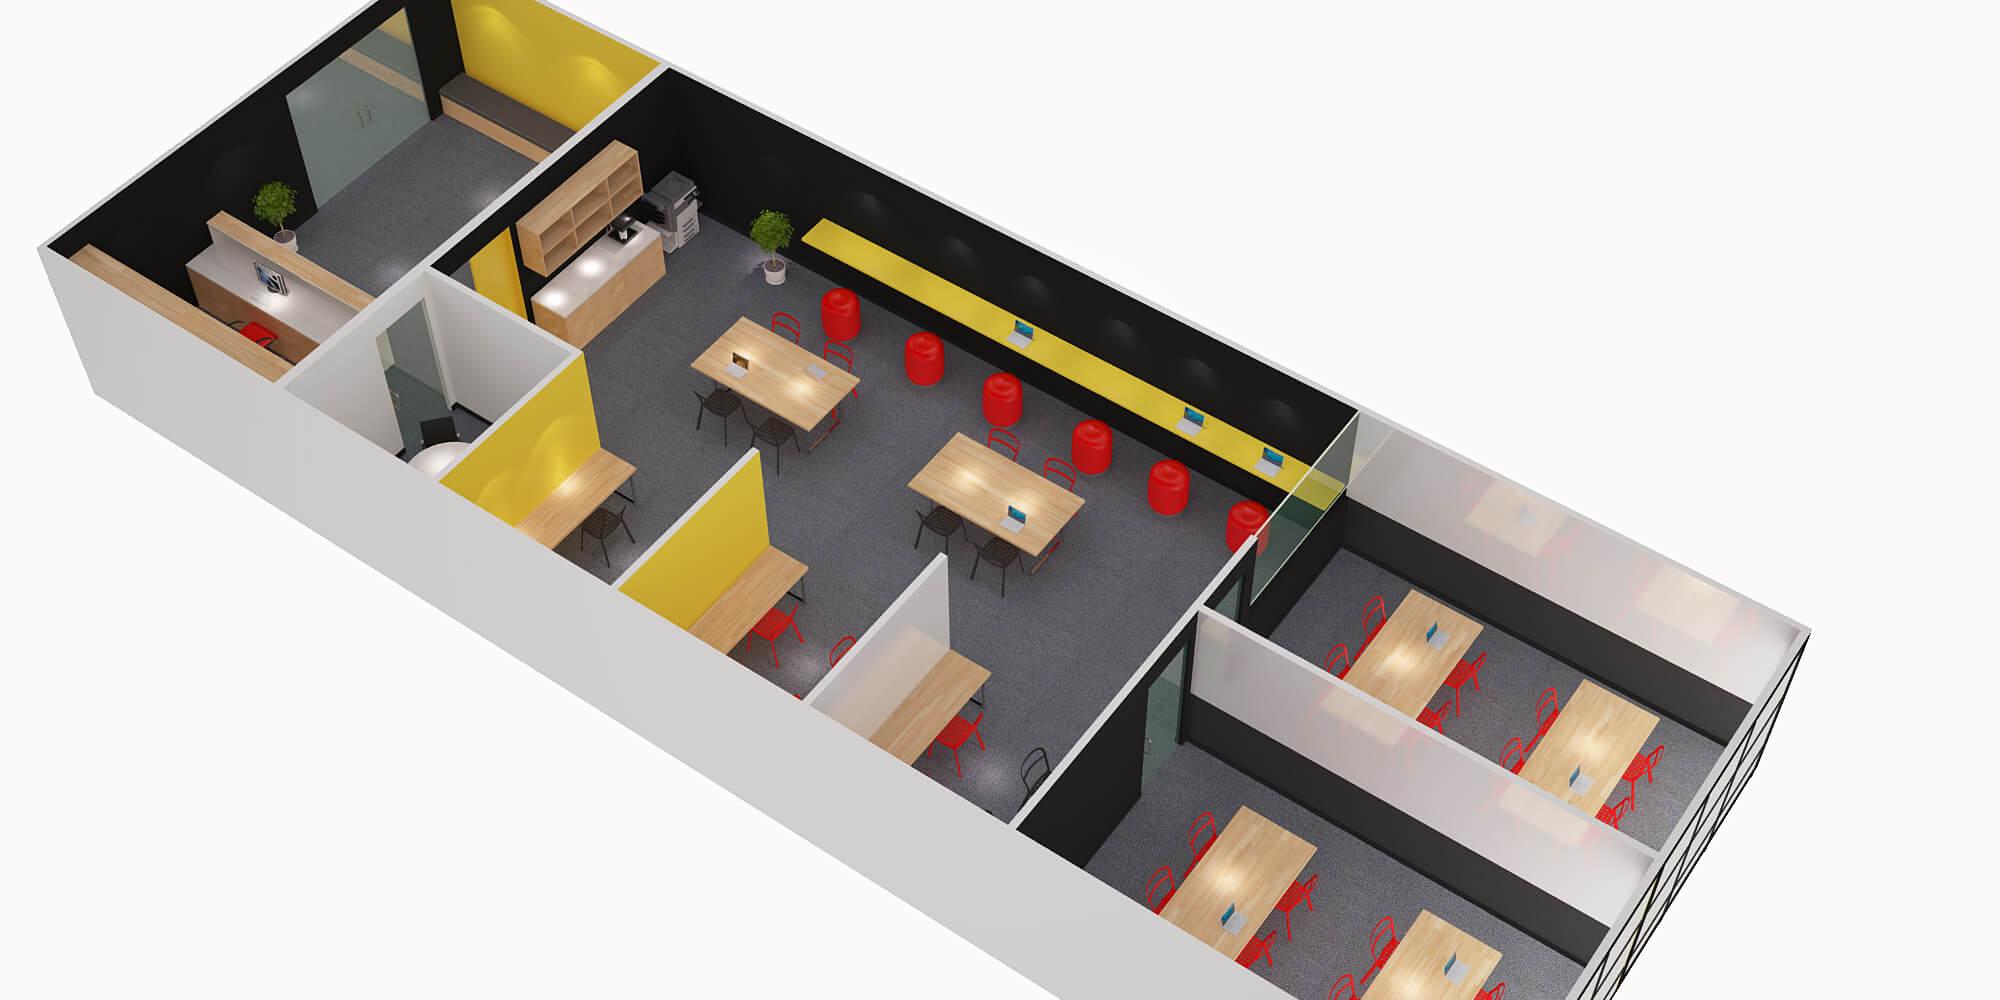 3d Floor Plan_Revision1_View 2